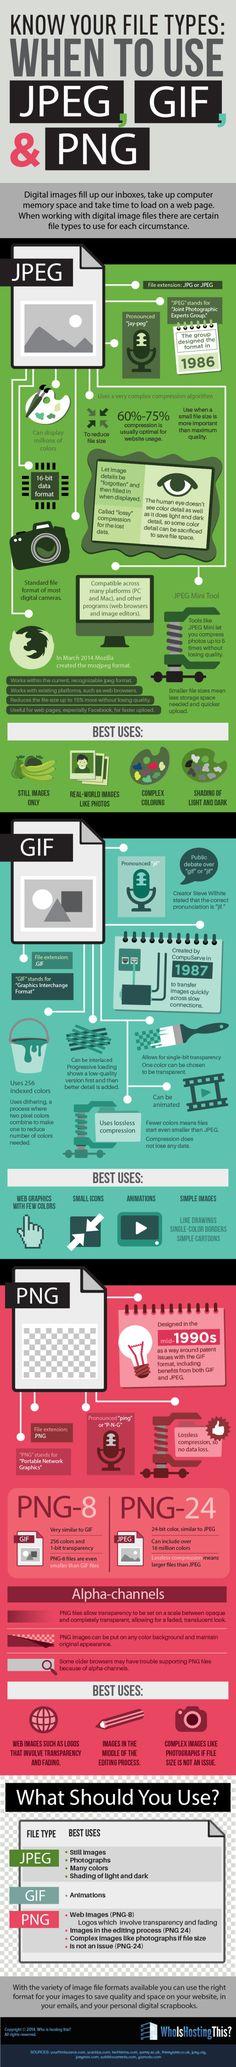 Bildformate im Übergblick: Wann du JPEG, GIF oder PNG benutzt (Infografik: WhoIsHostingThis) - via T3N